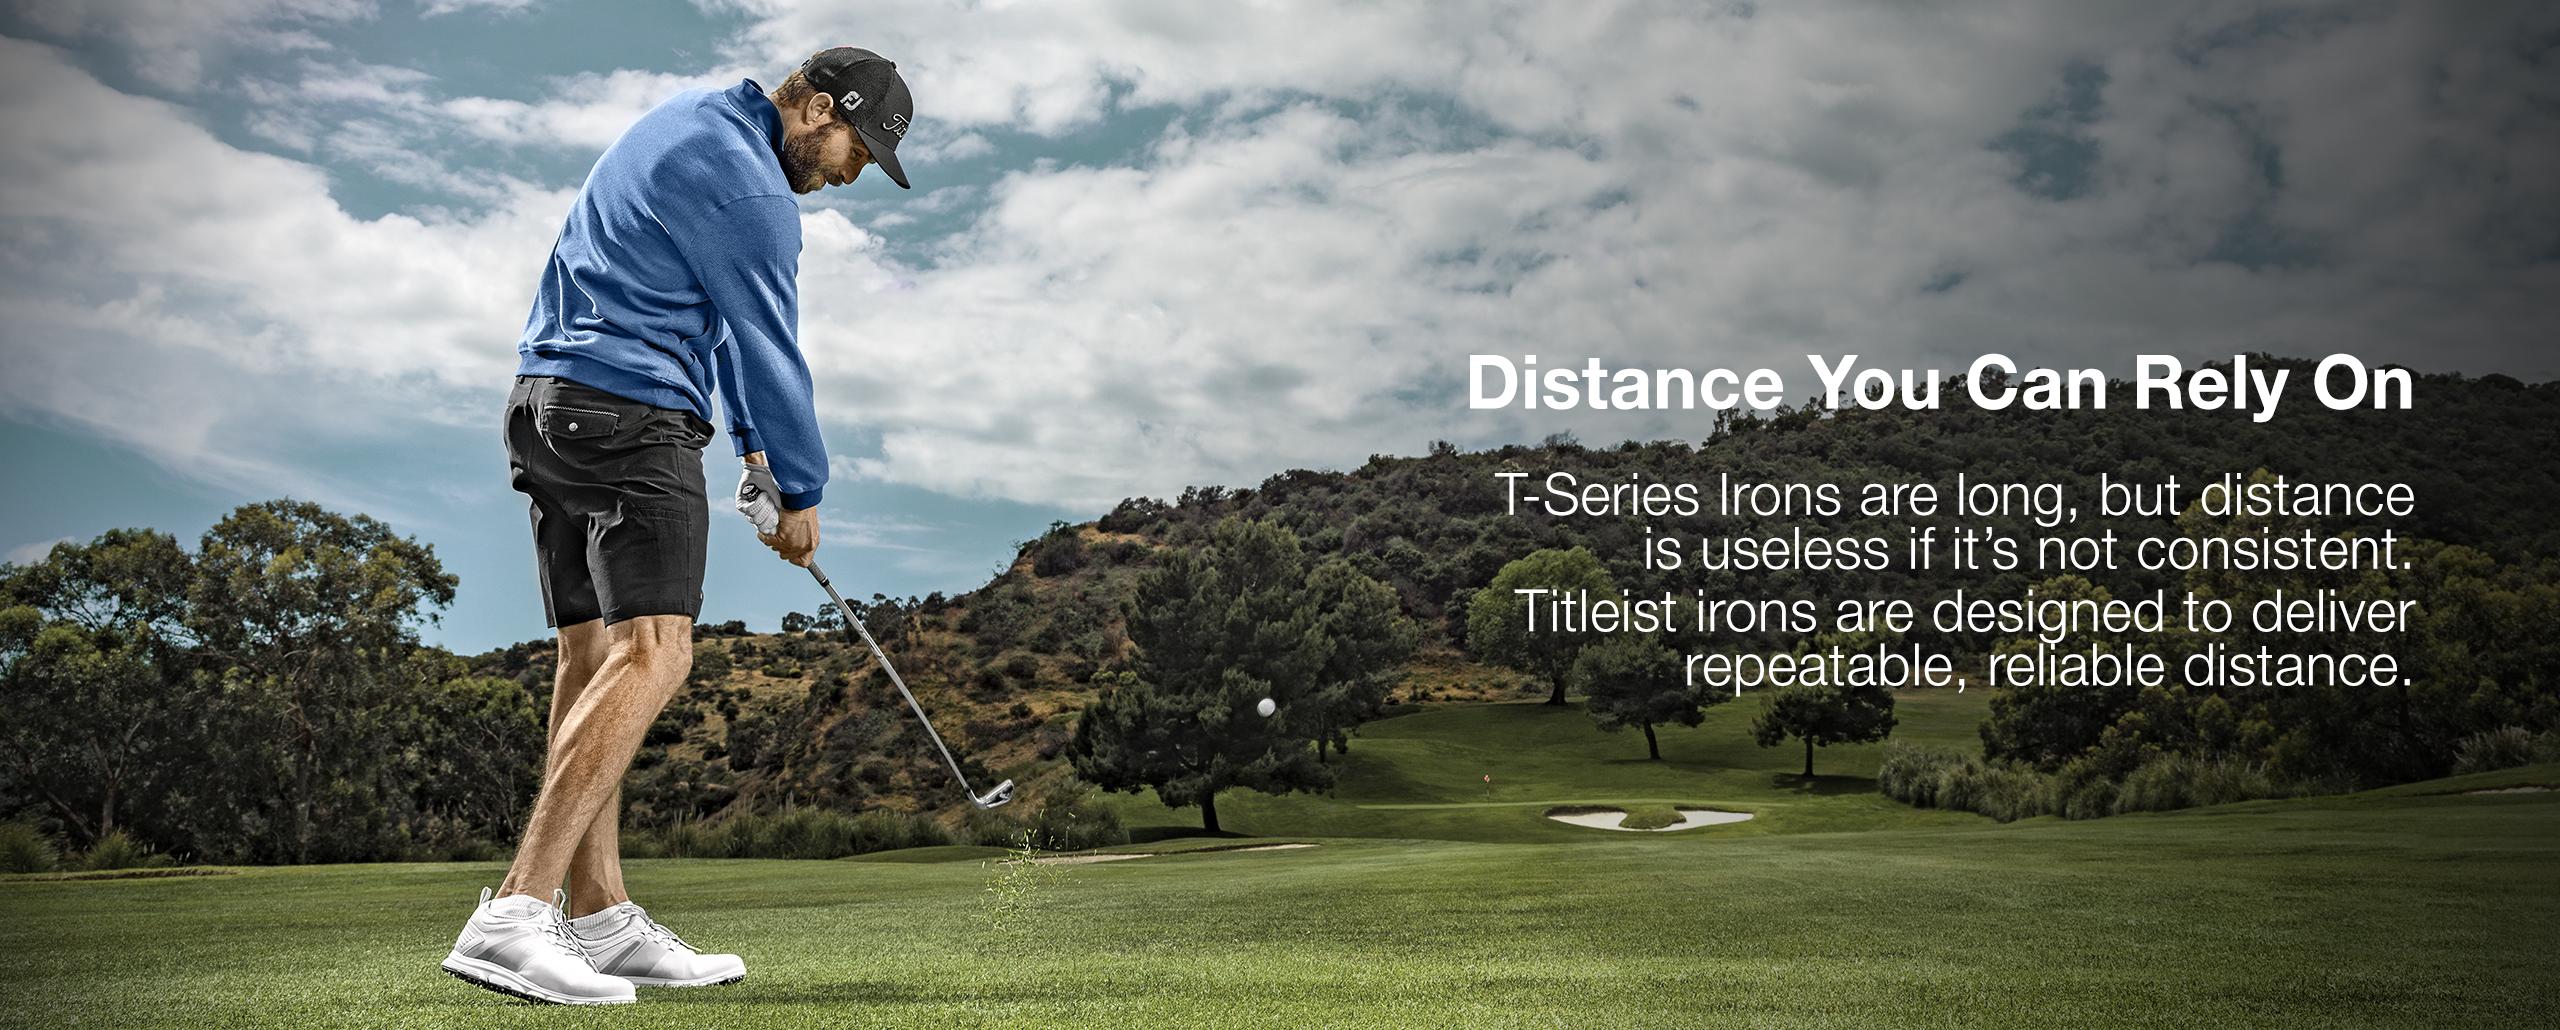 Titleist T-Series Consistent Distance Image